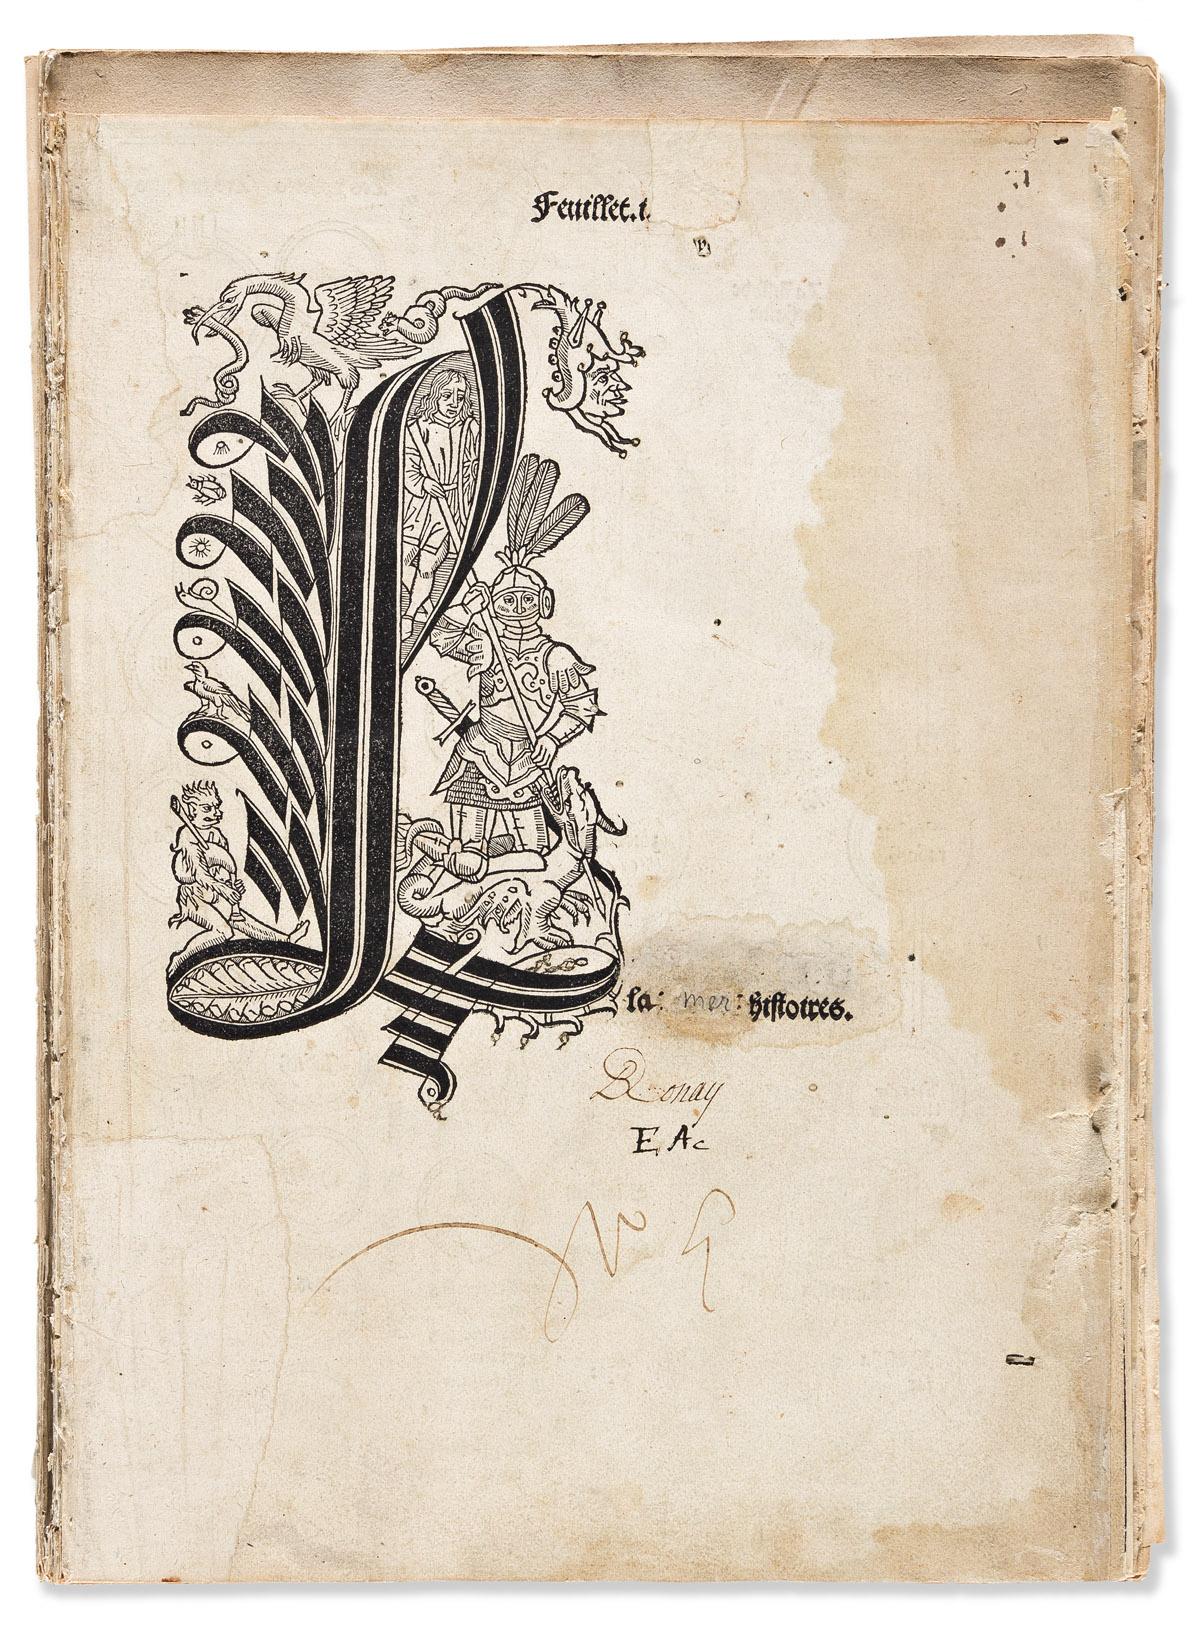 Illustrated Incunabula Fragment. Mer des Histoires.